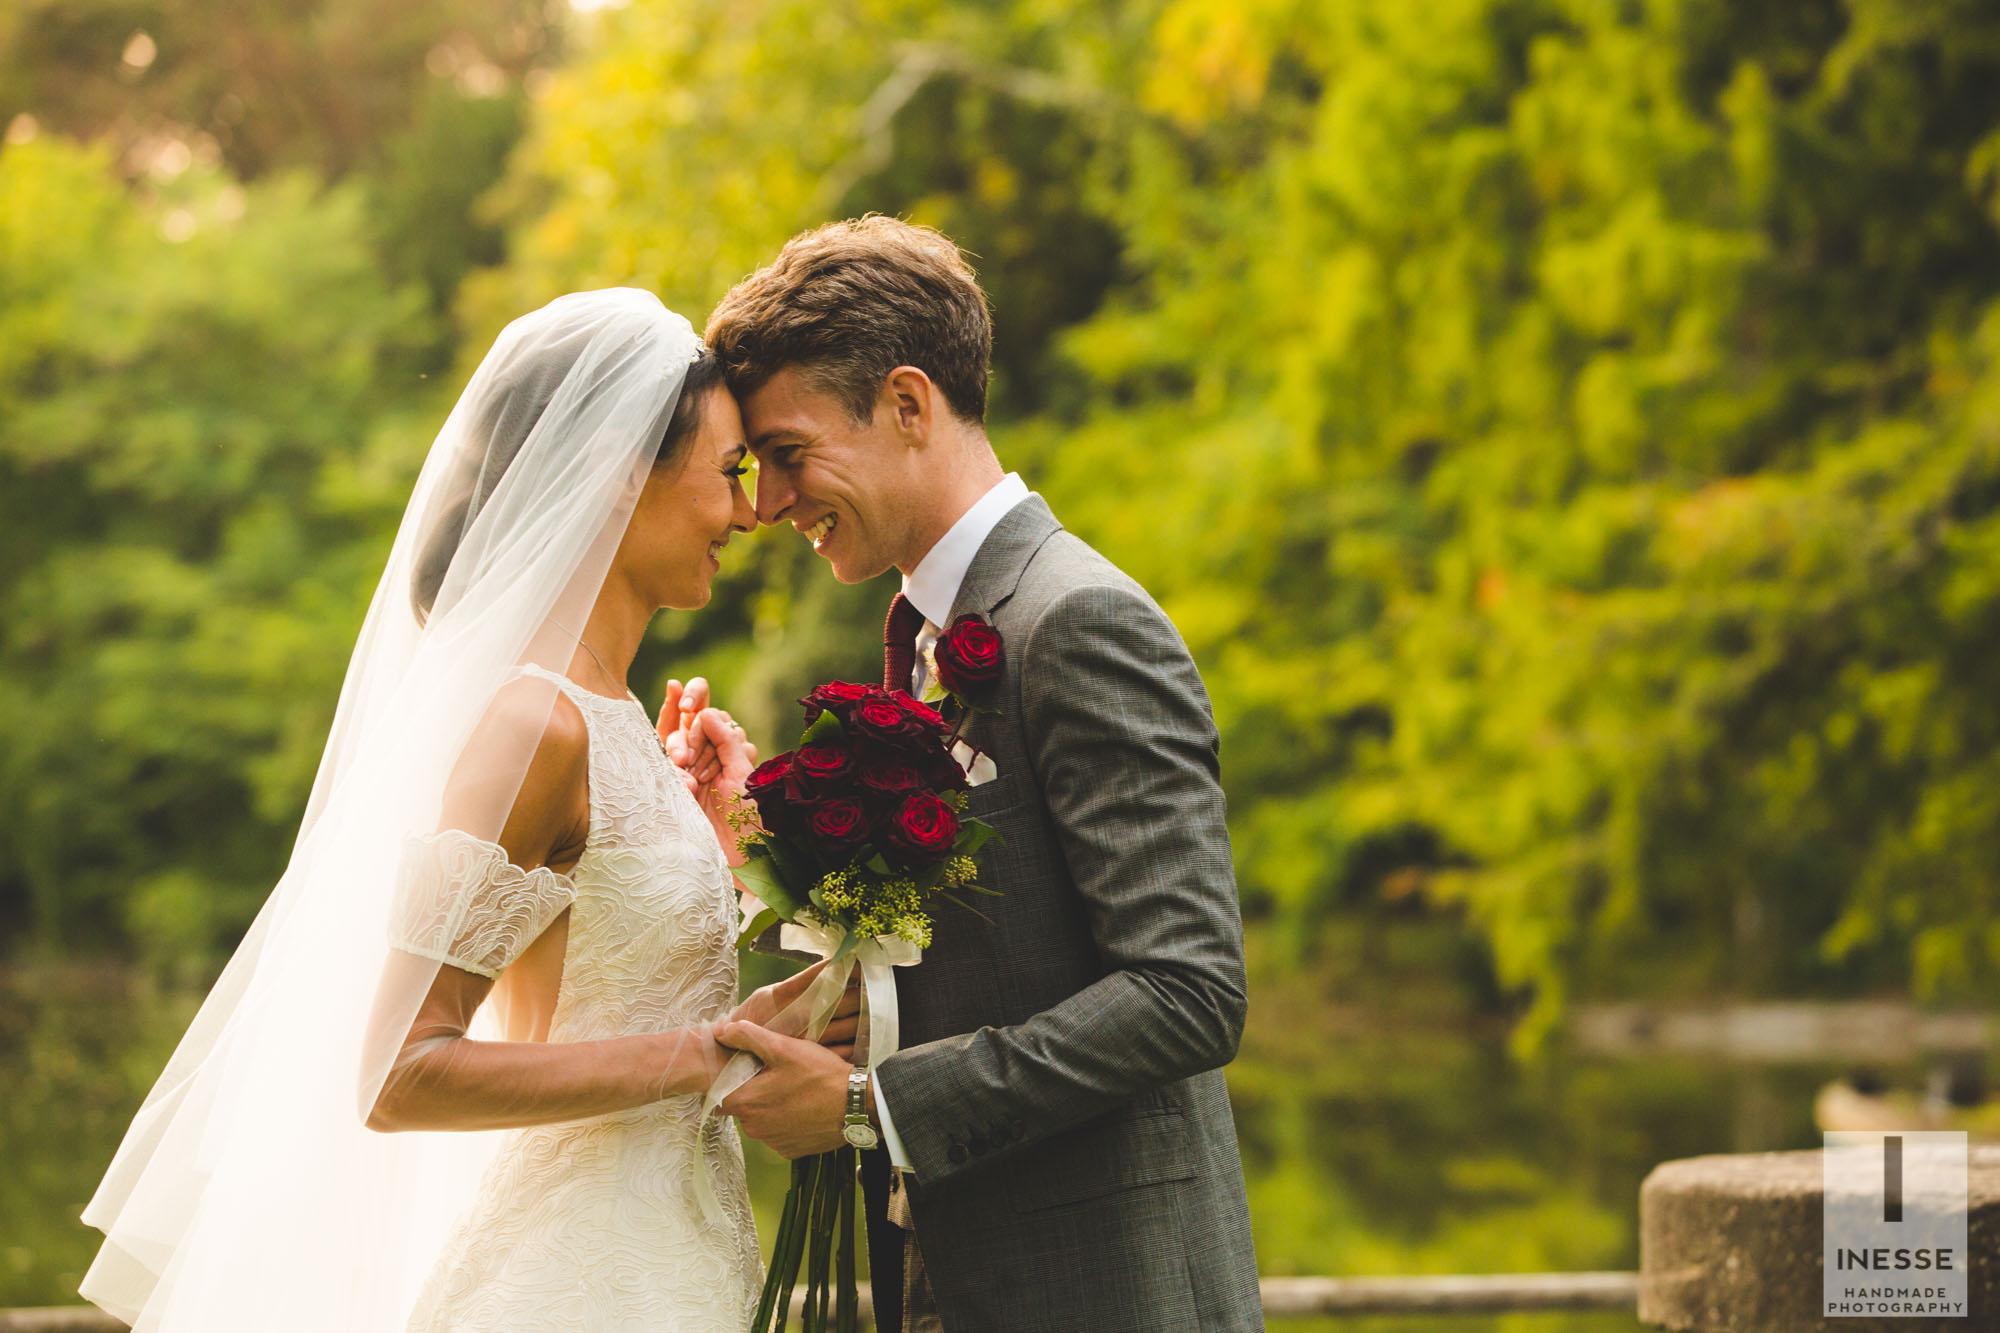 Best wedding photographers in Italy: Inesse Handmade Photography